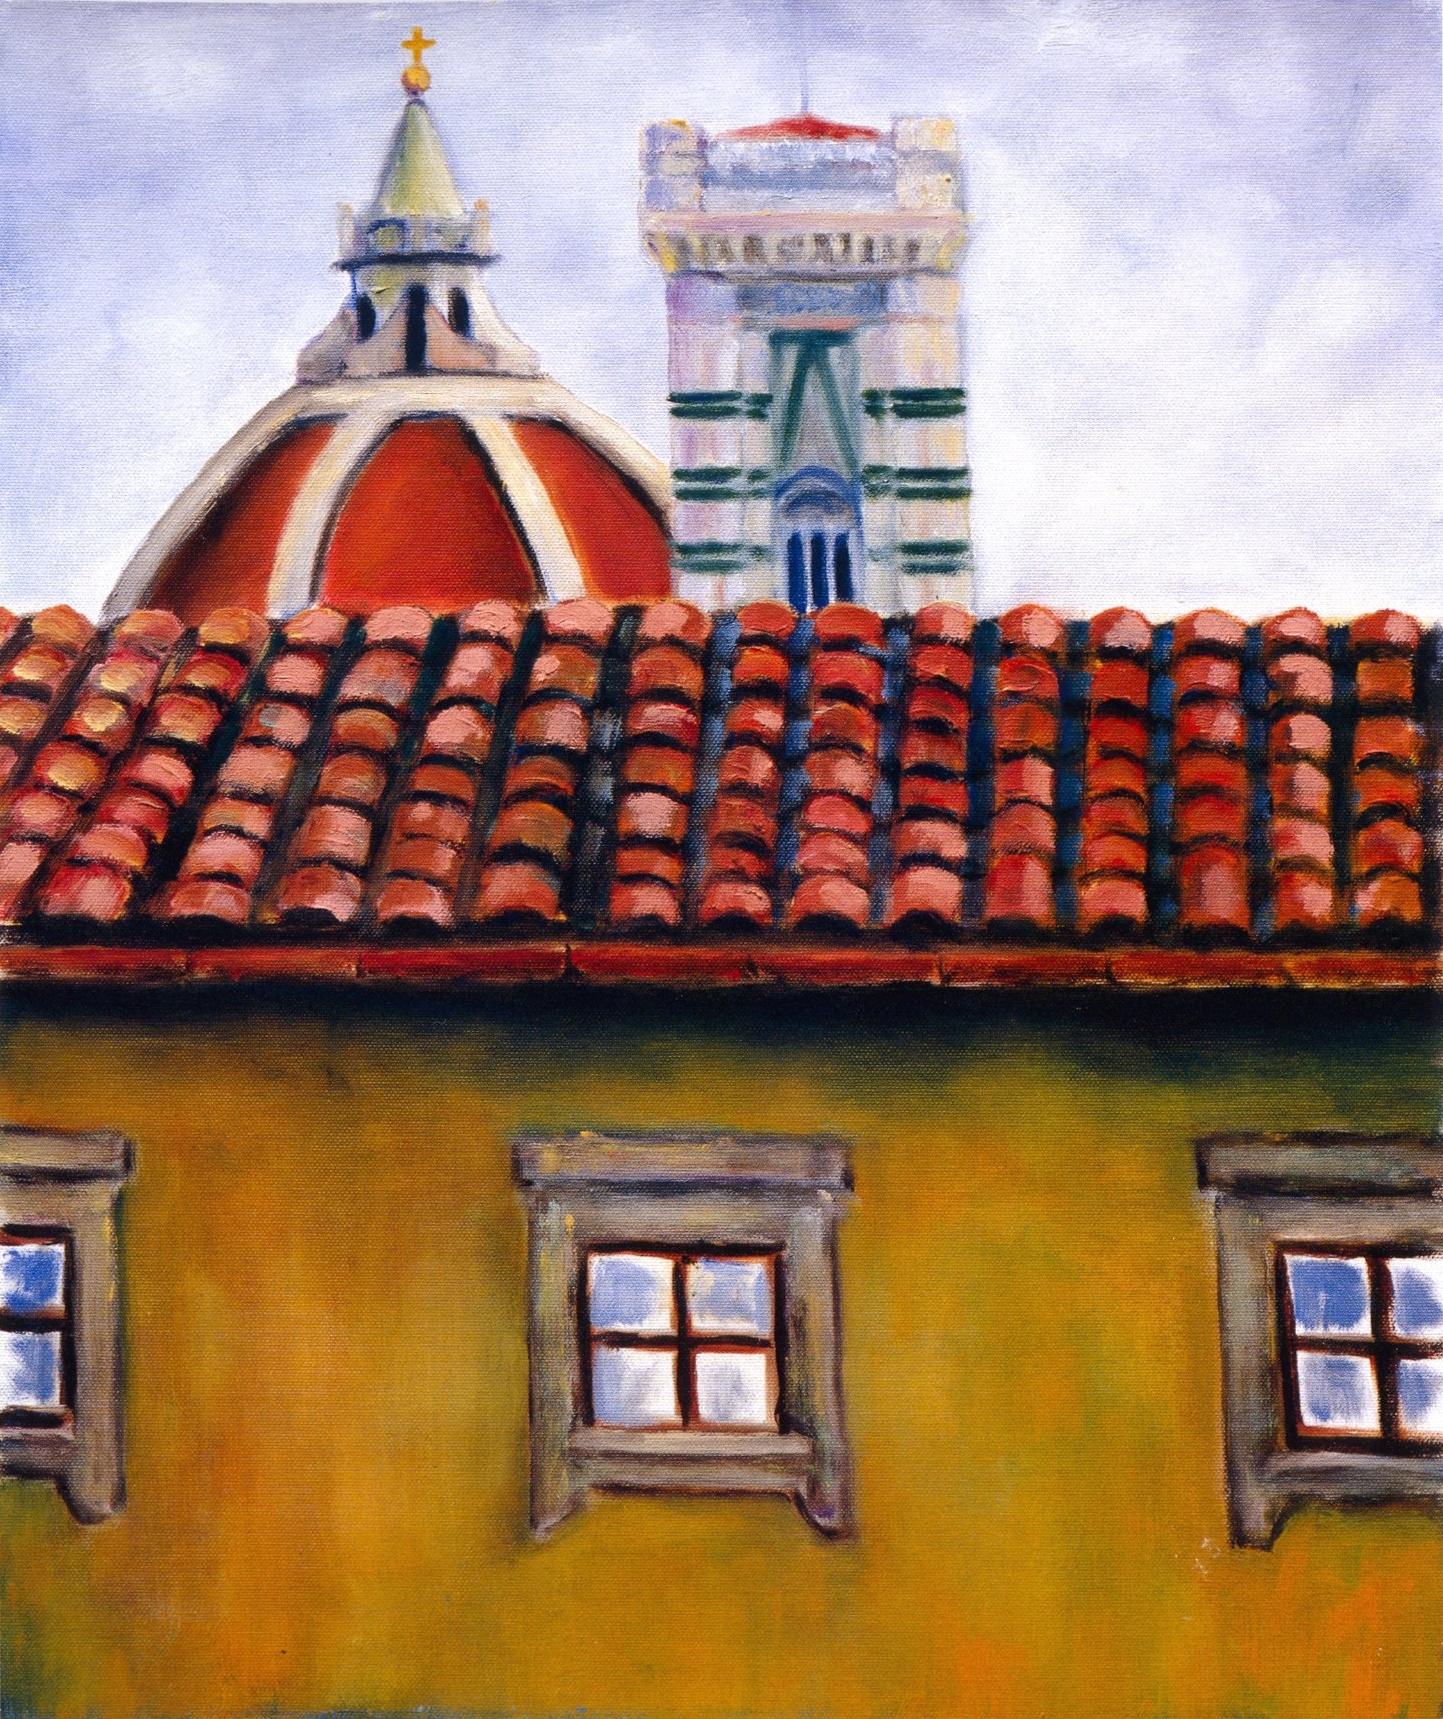 Vista de Studio Mio Firenze   Oil on canvas, 20'' x 24'', 2004